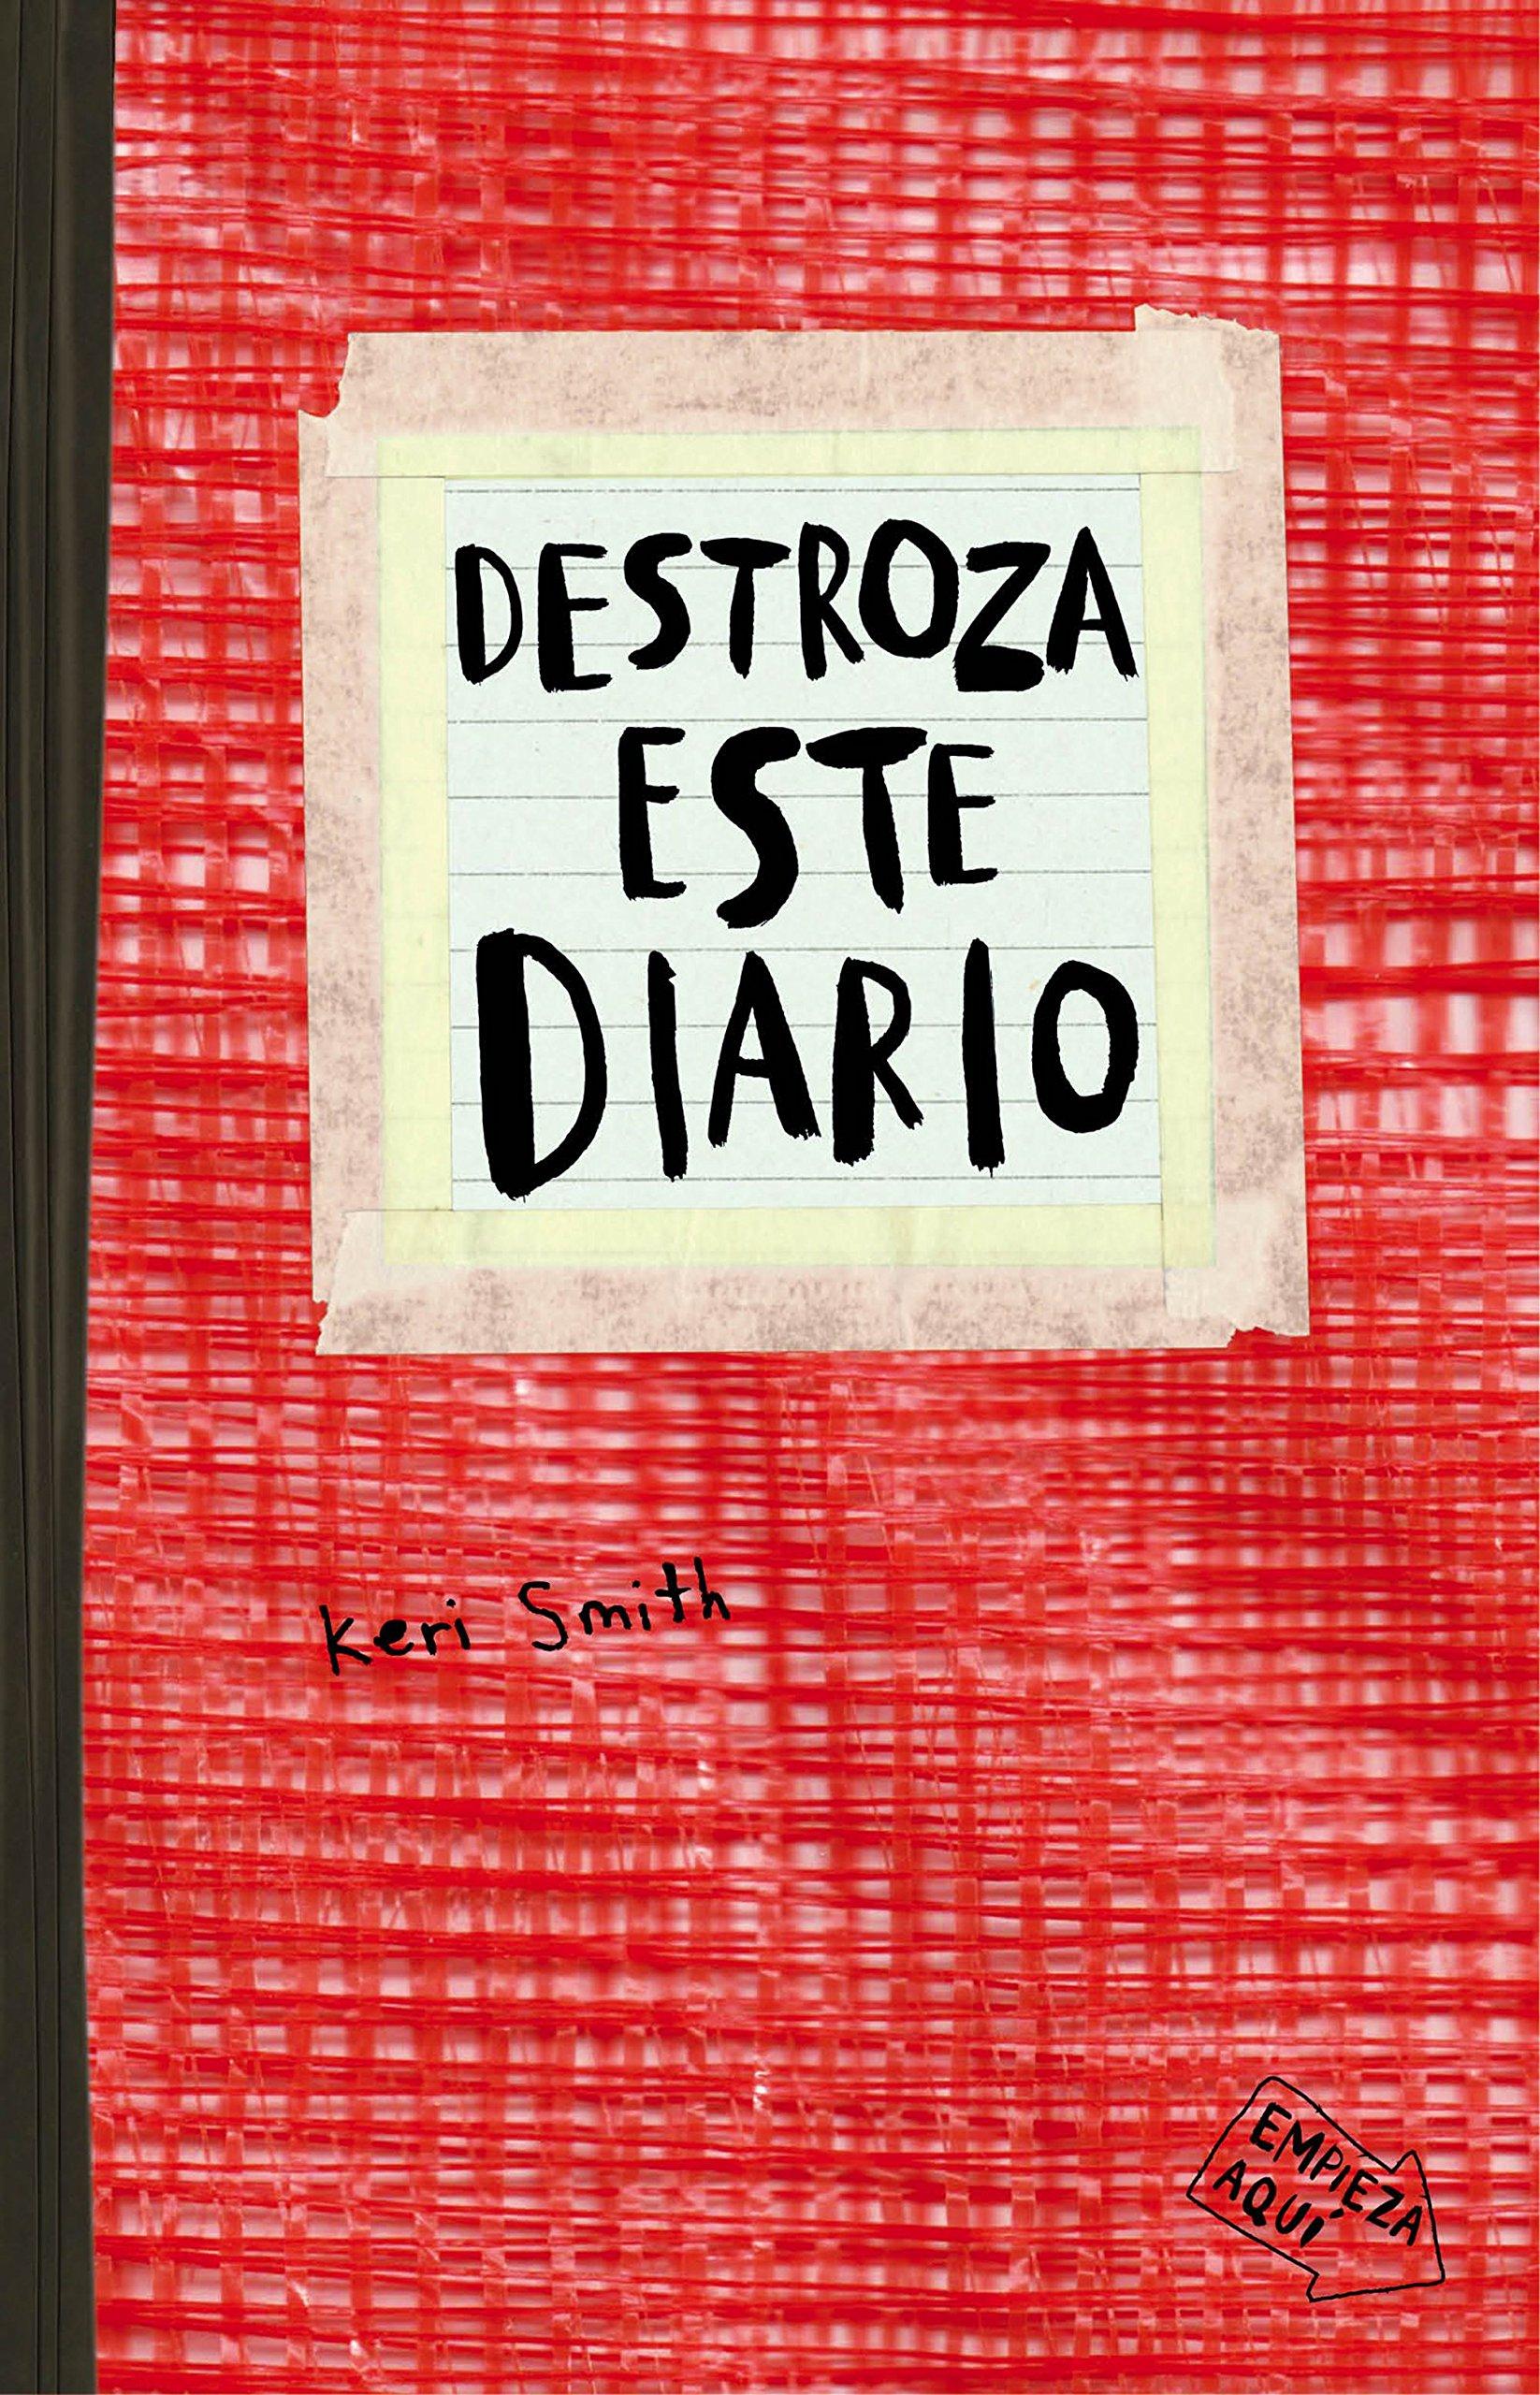 Destroza este diario. Rojo (Libros Singulares): Amazon.es: Smith, Keri, Diéguez Diéguez, Remedios: Libros